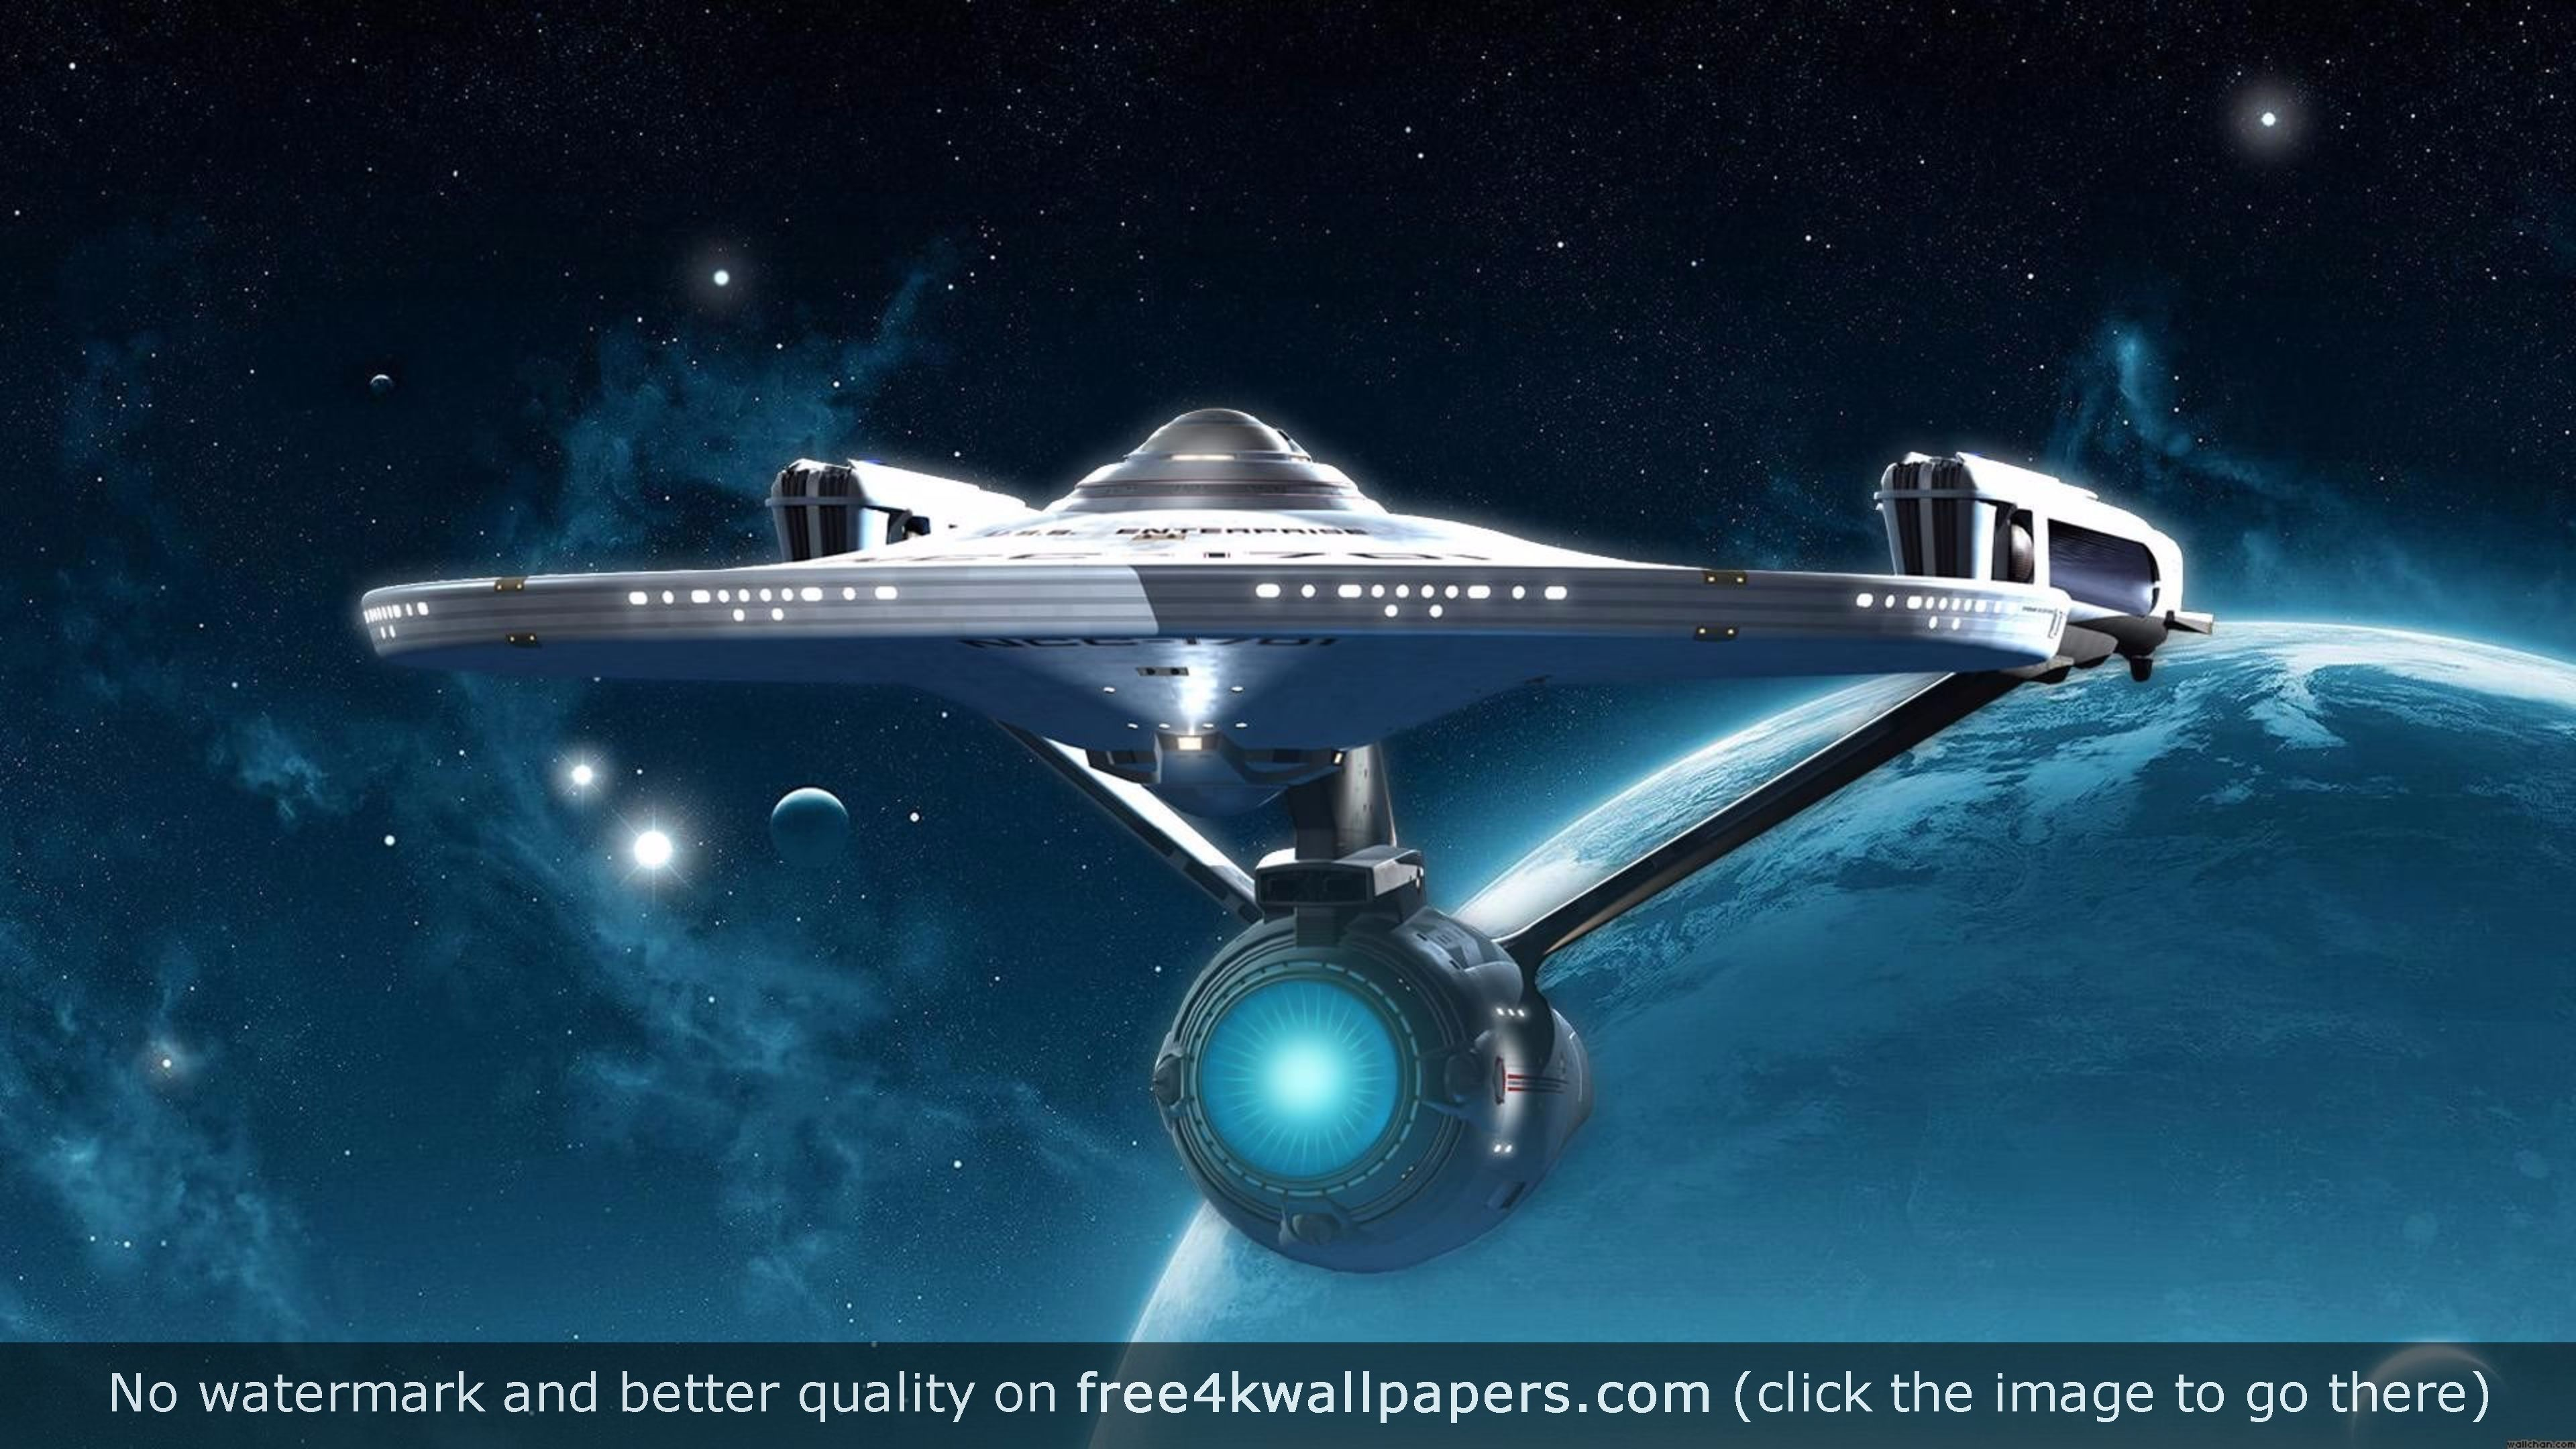 Download Star Trek Beyond 4k Wallpaper Star Trek Wallpaper Star Trek Tv Star Trek Enterprise